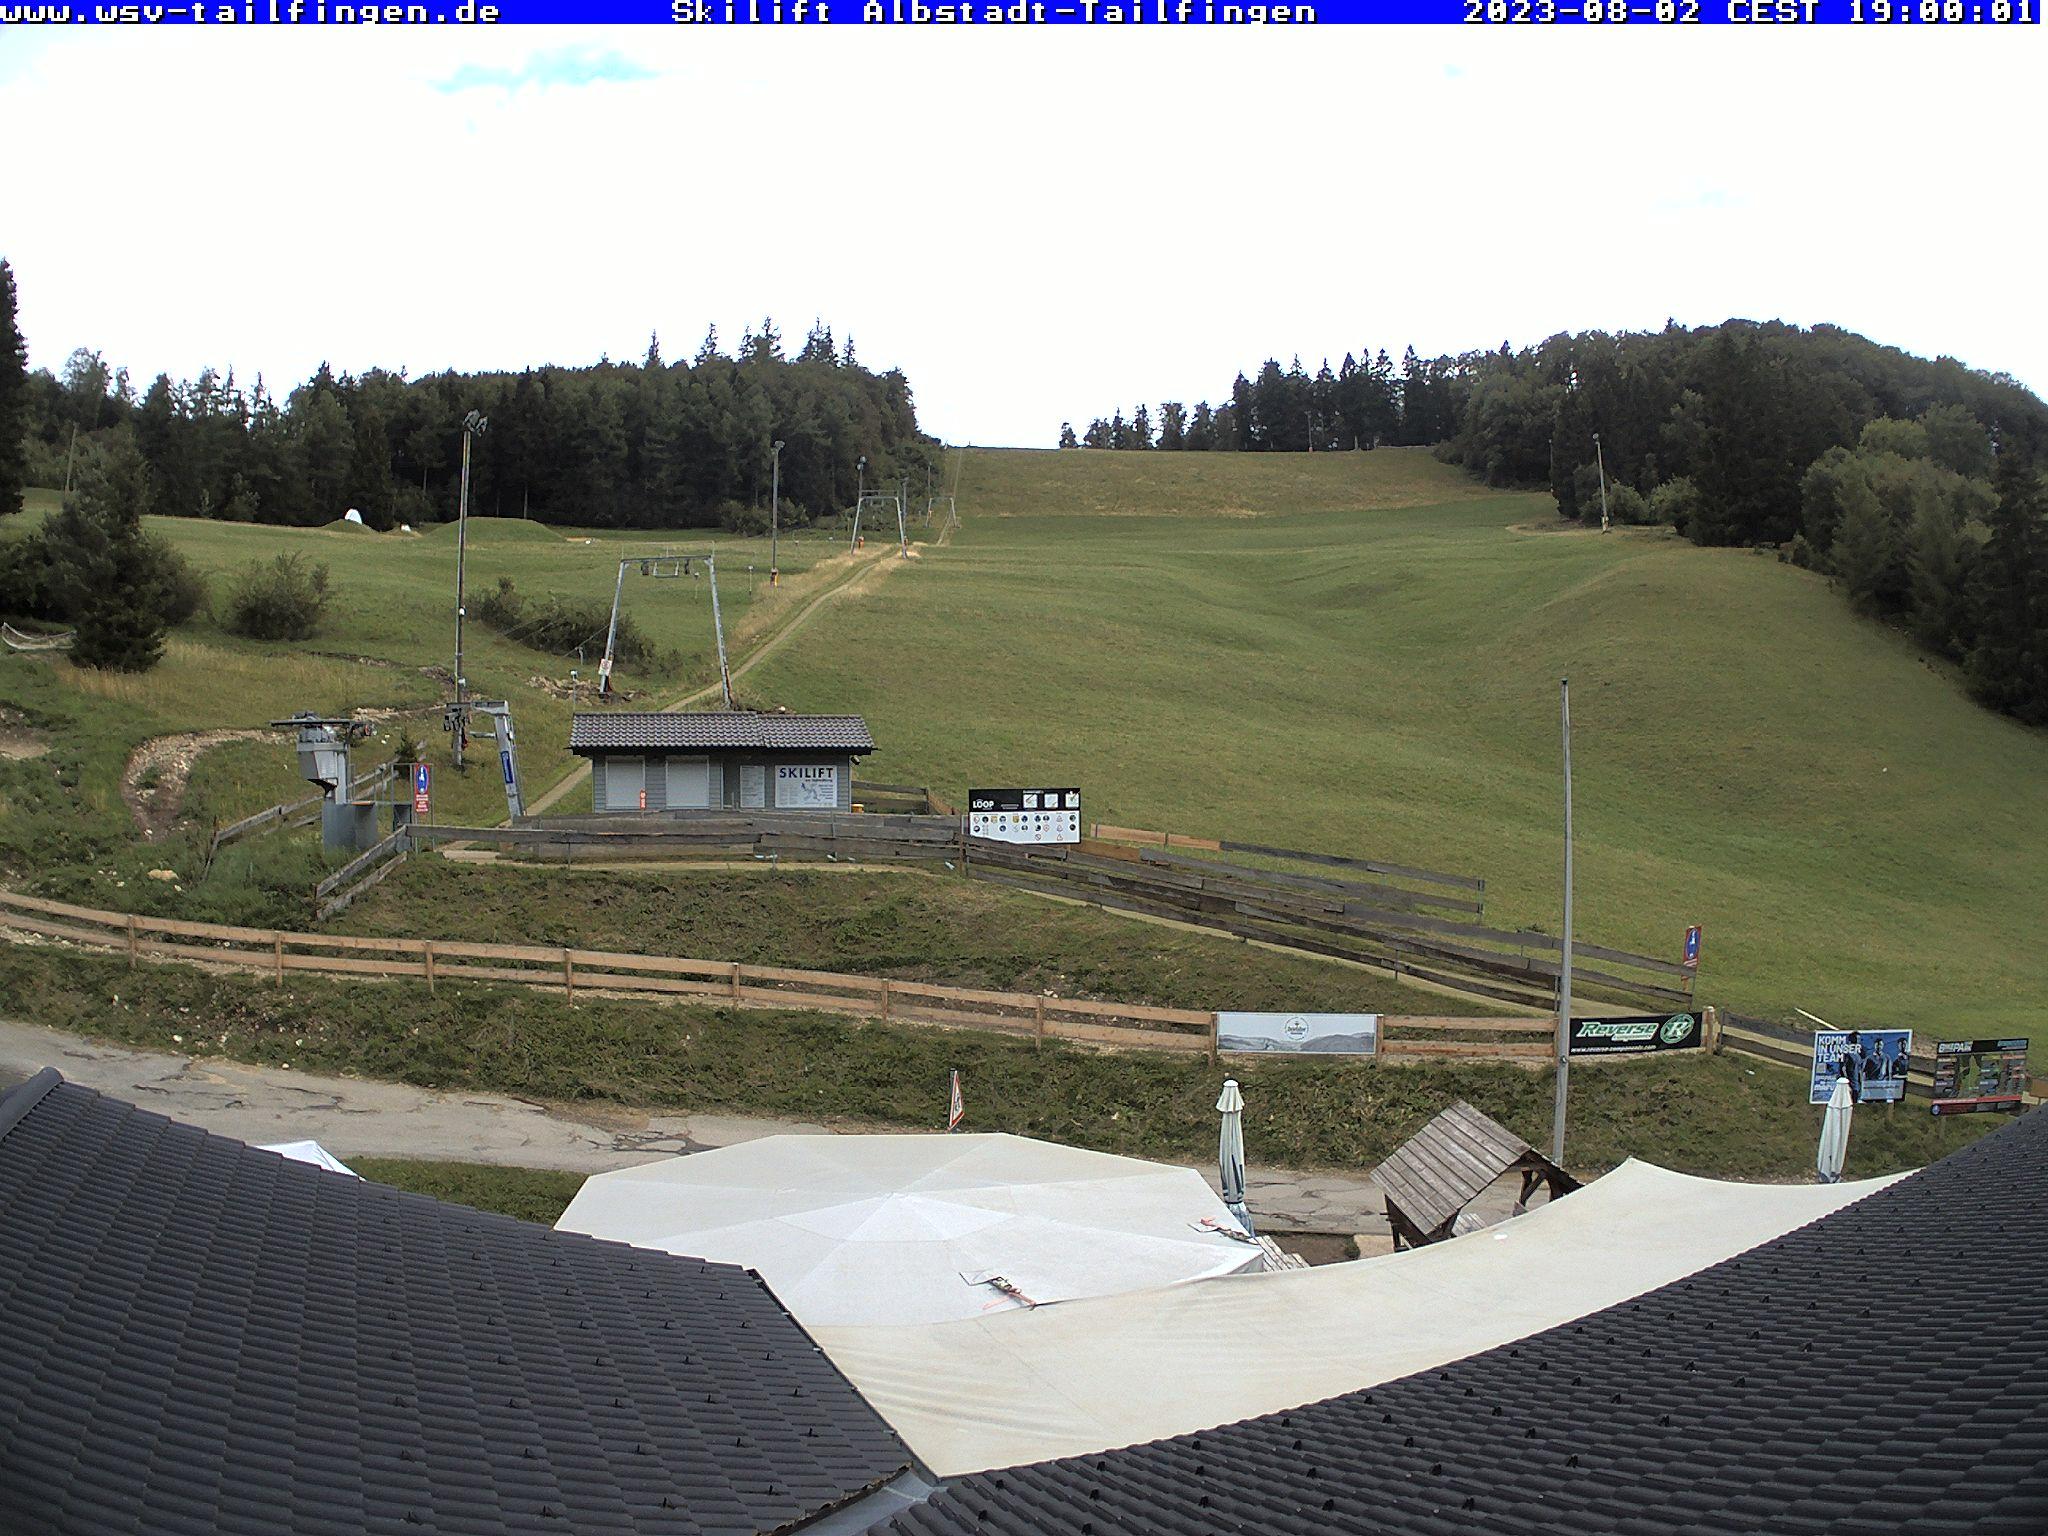 Webcam-Foto 19:00 Uhr / Skilift Albstadt-Tailfingen